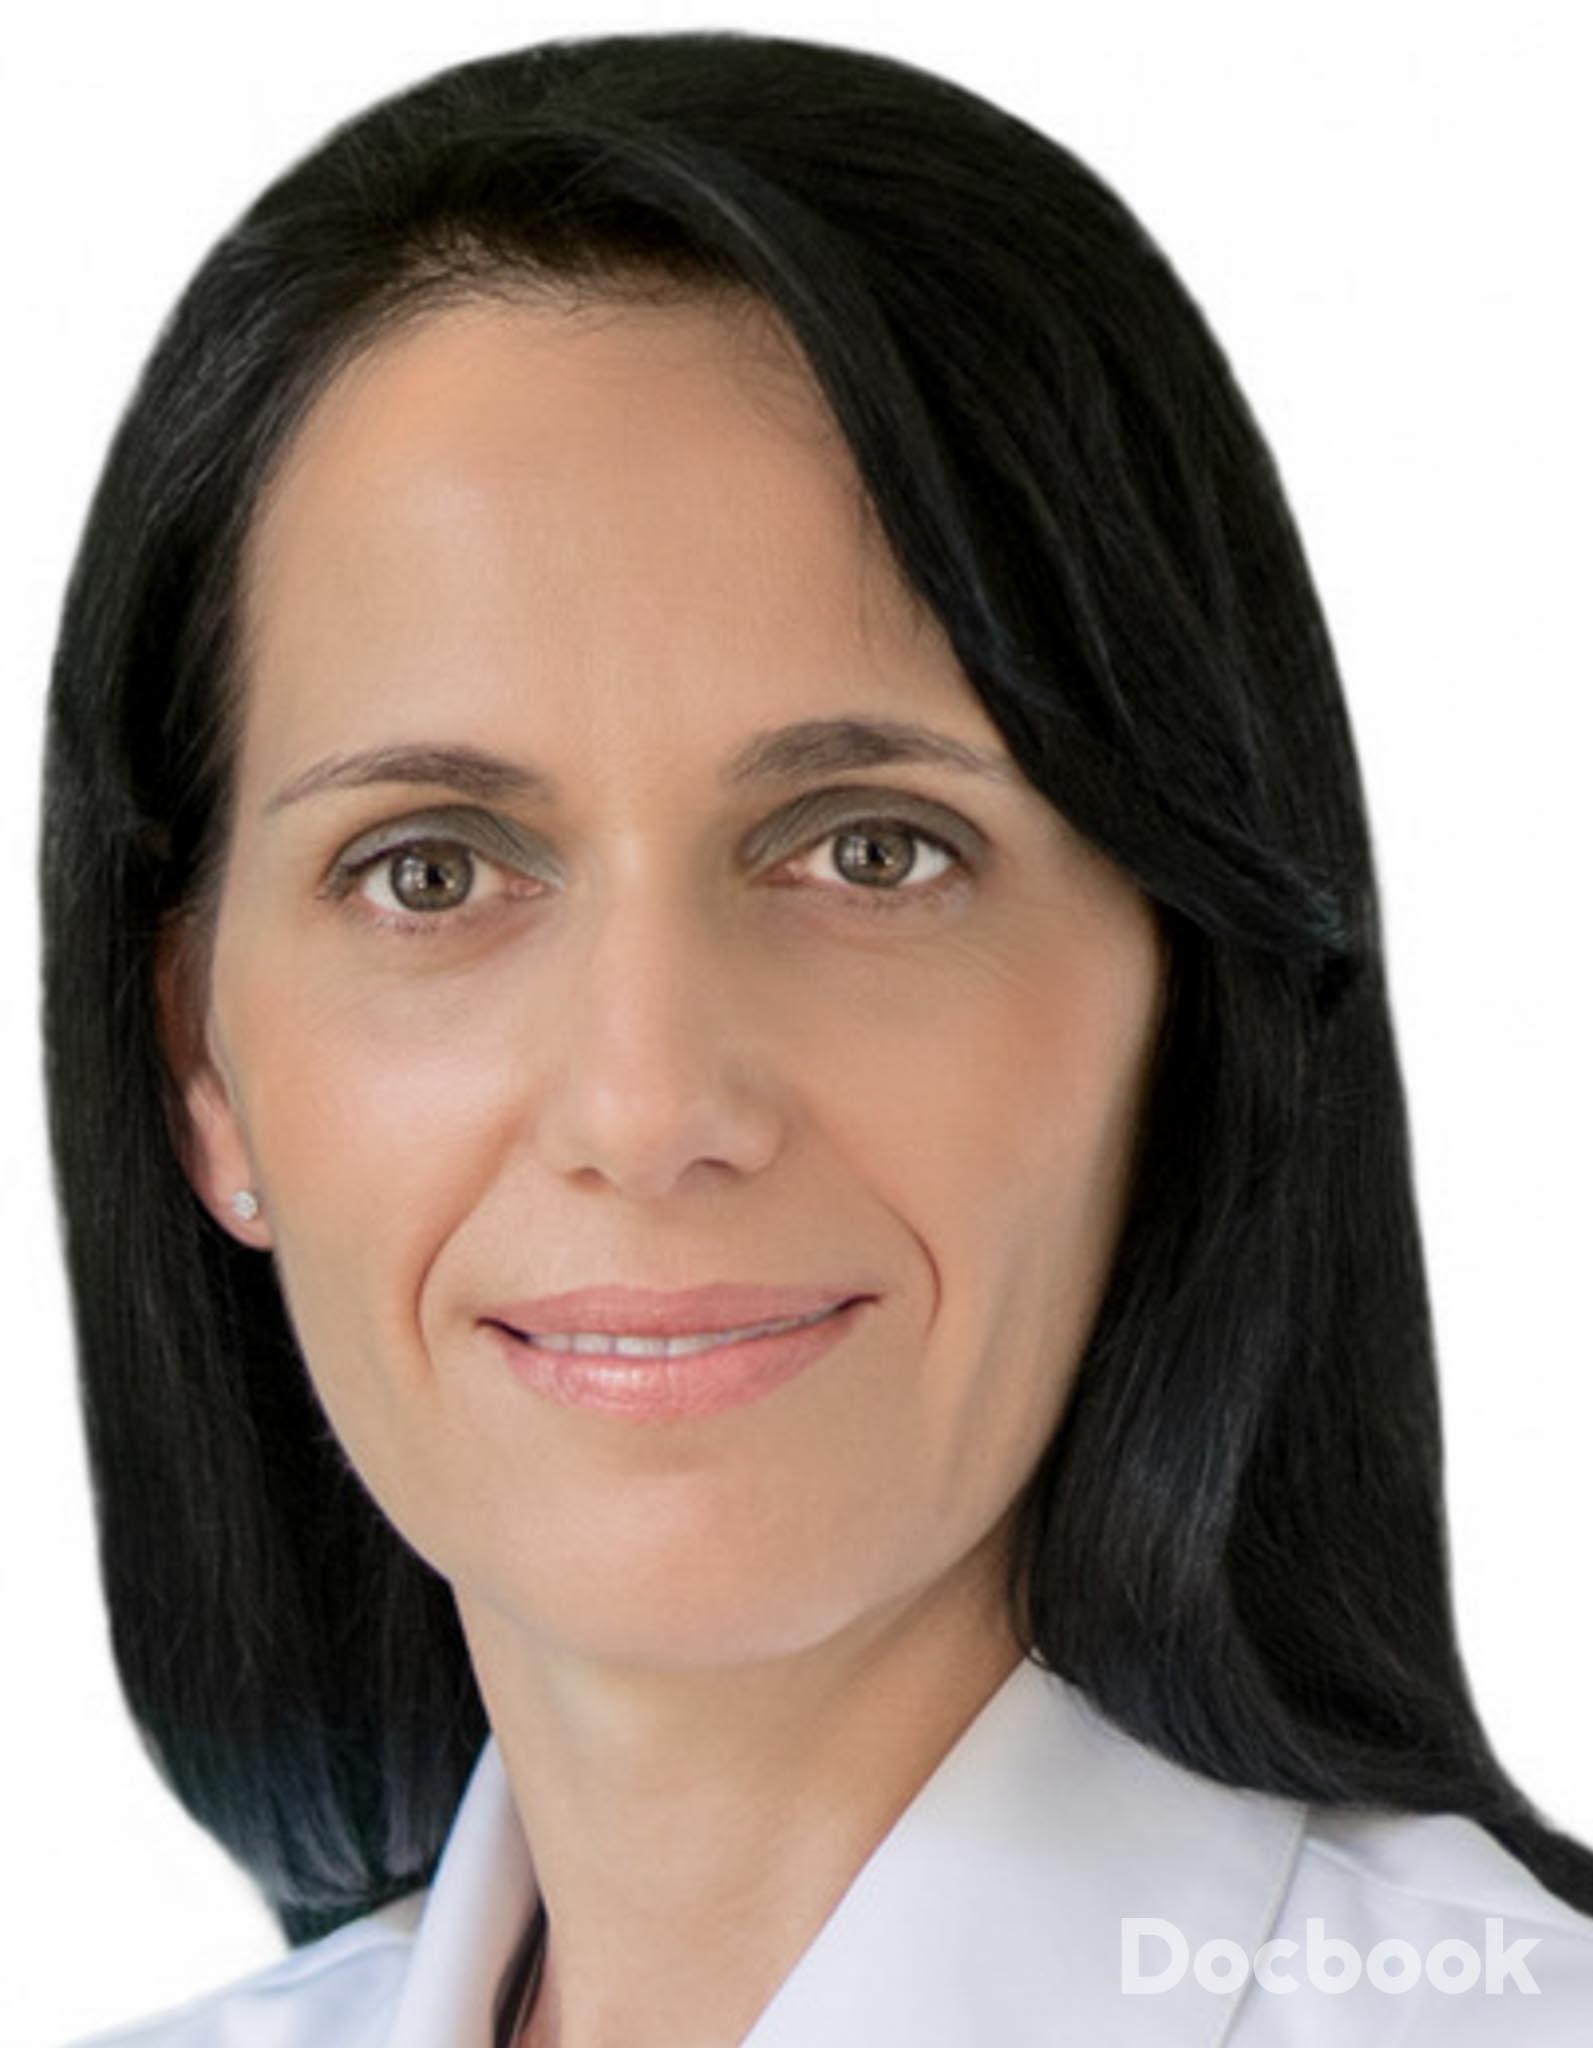 Dr. Monica Apostolescu